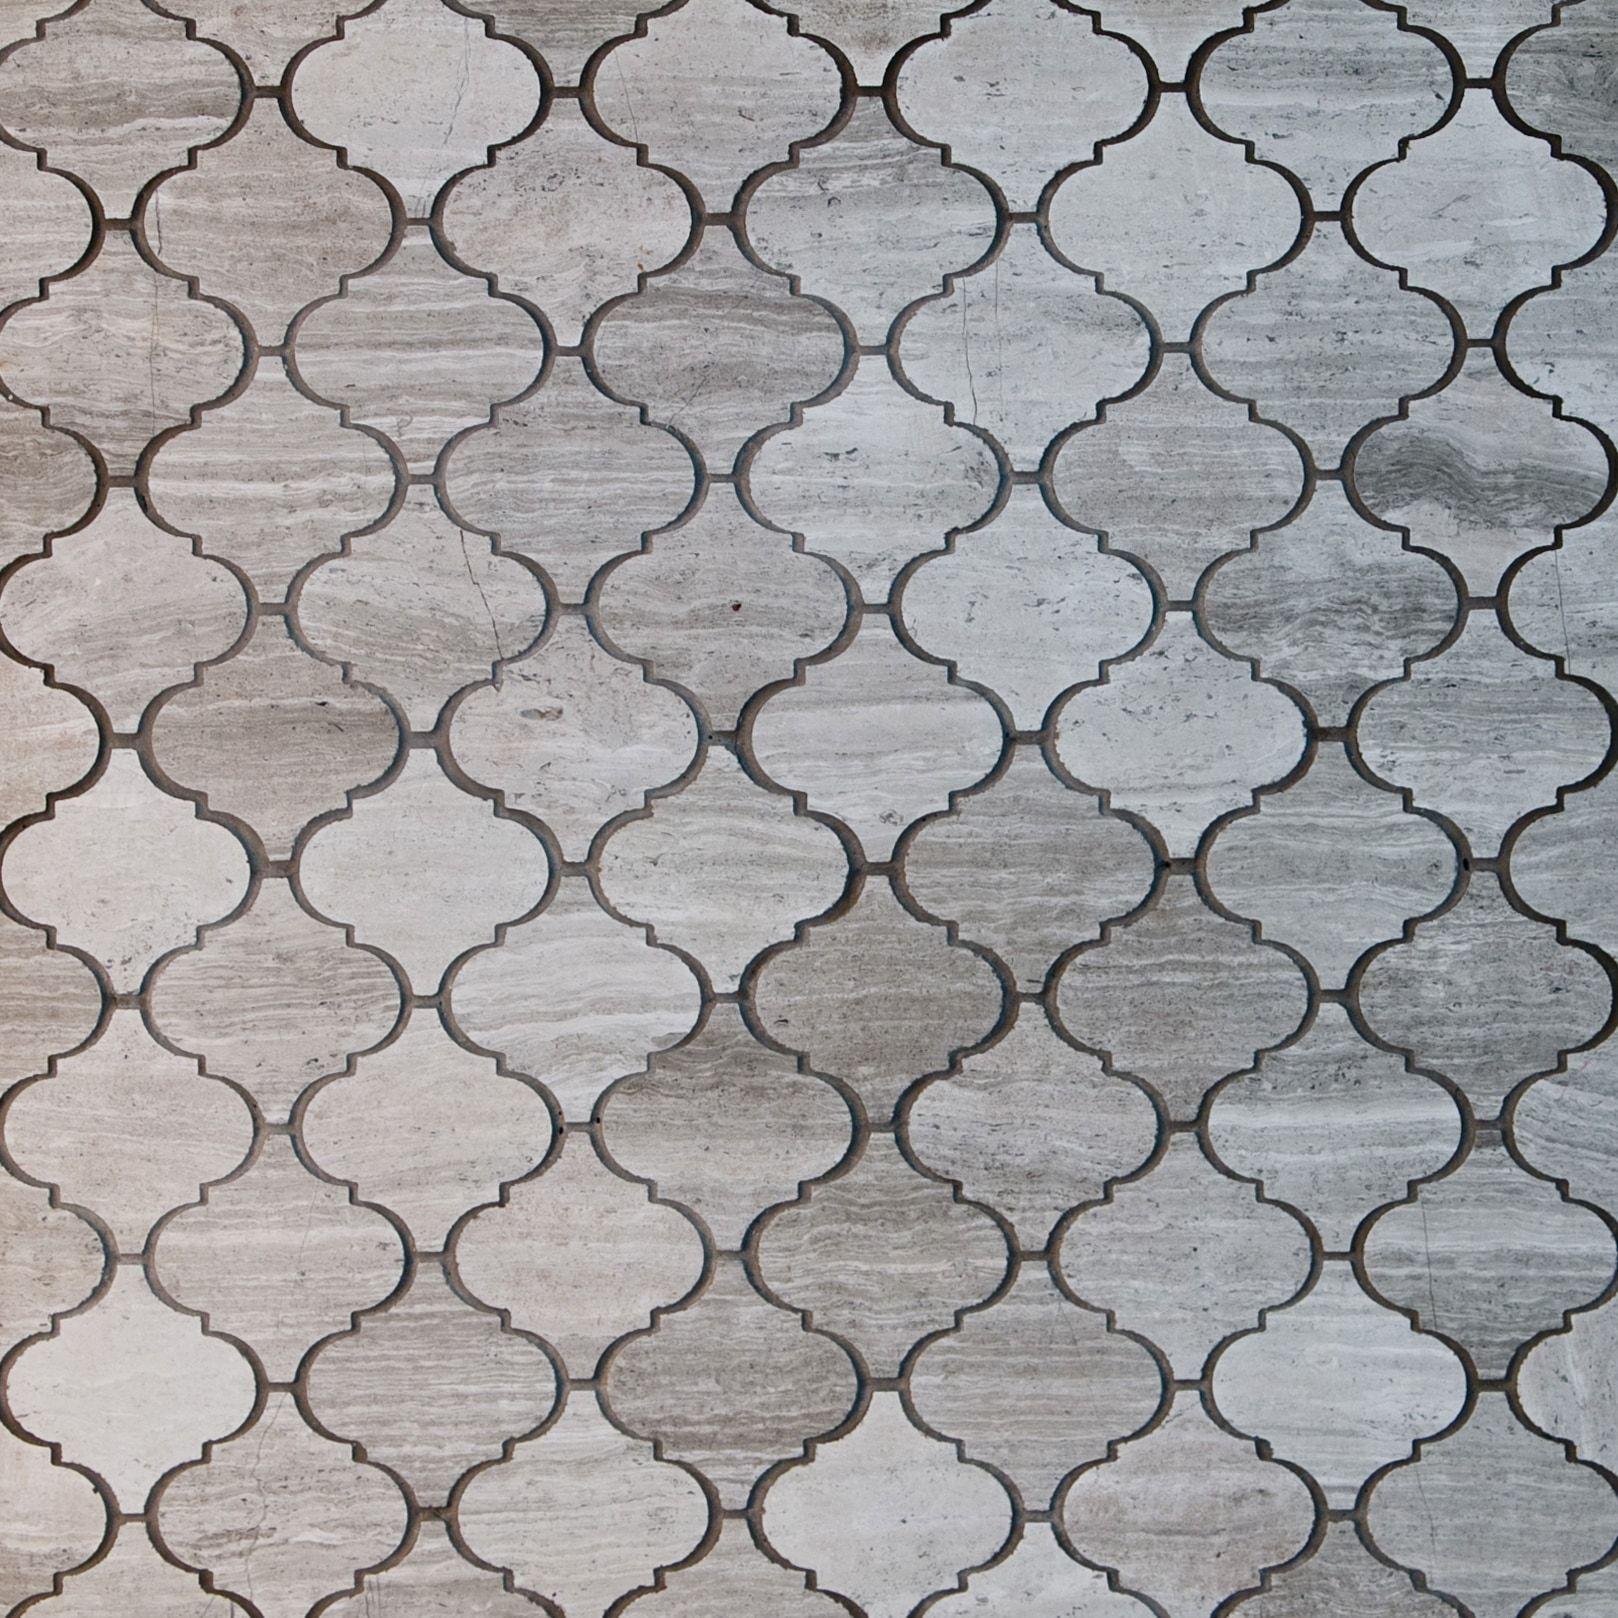 Tile Arabesque Pattern Marble Mosaics